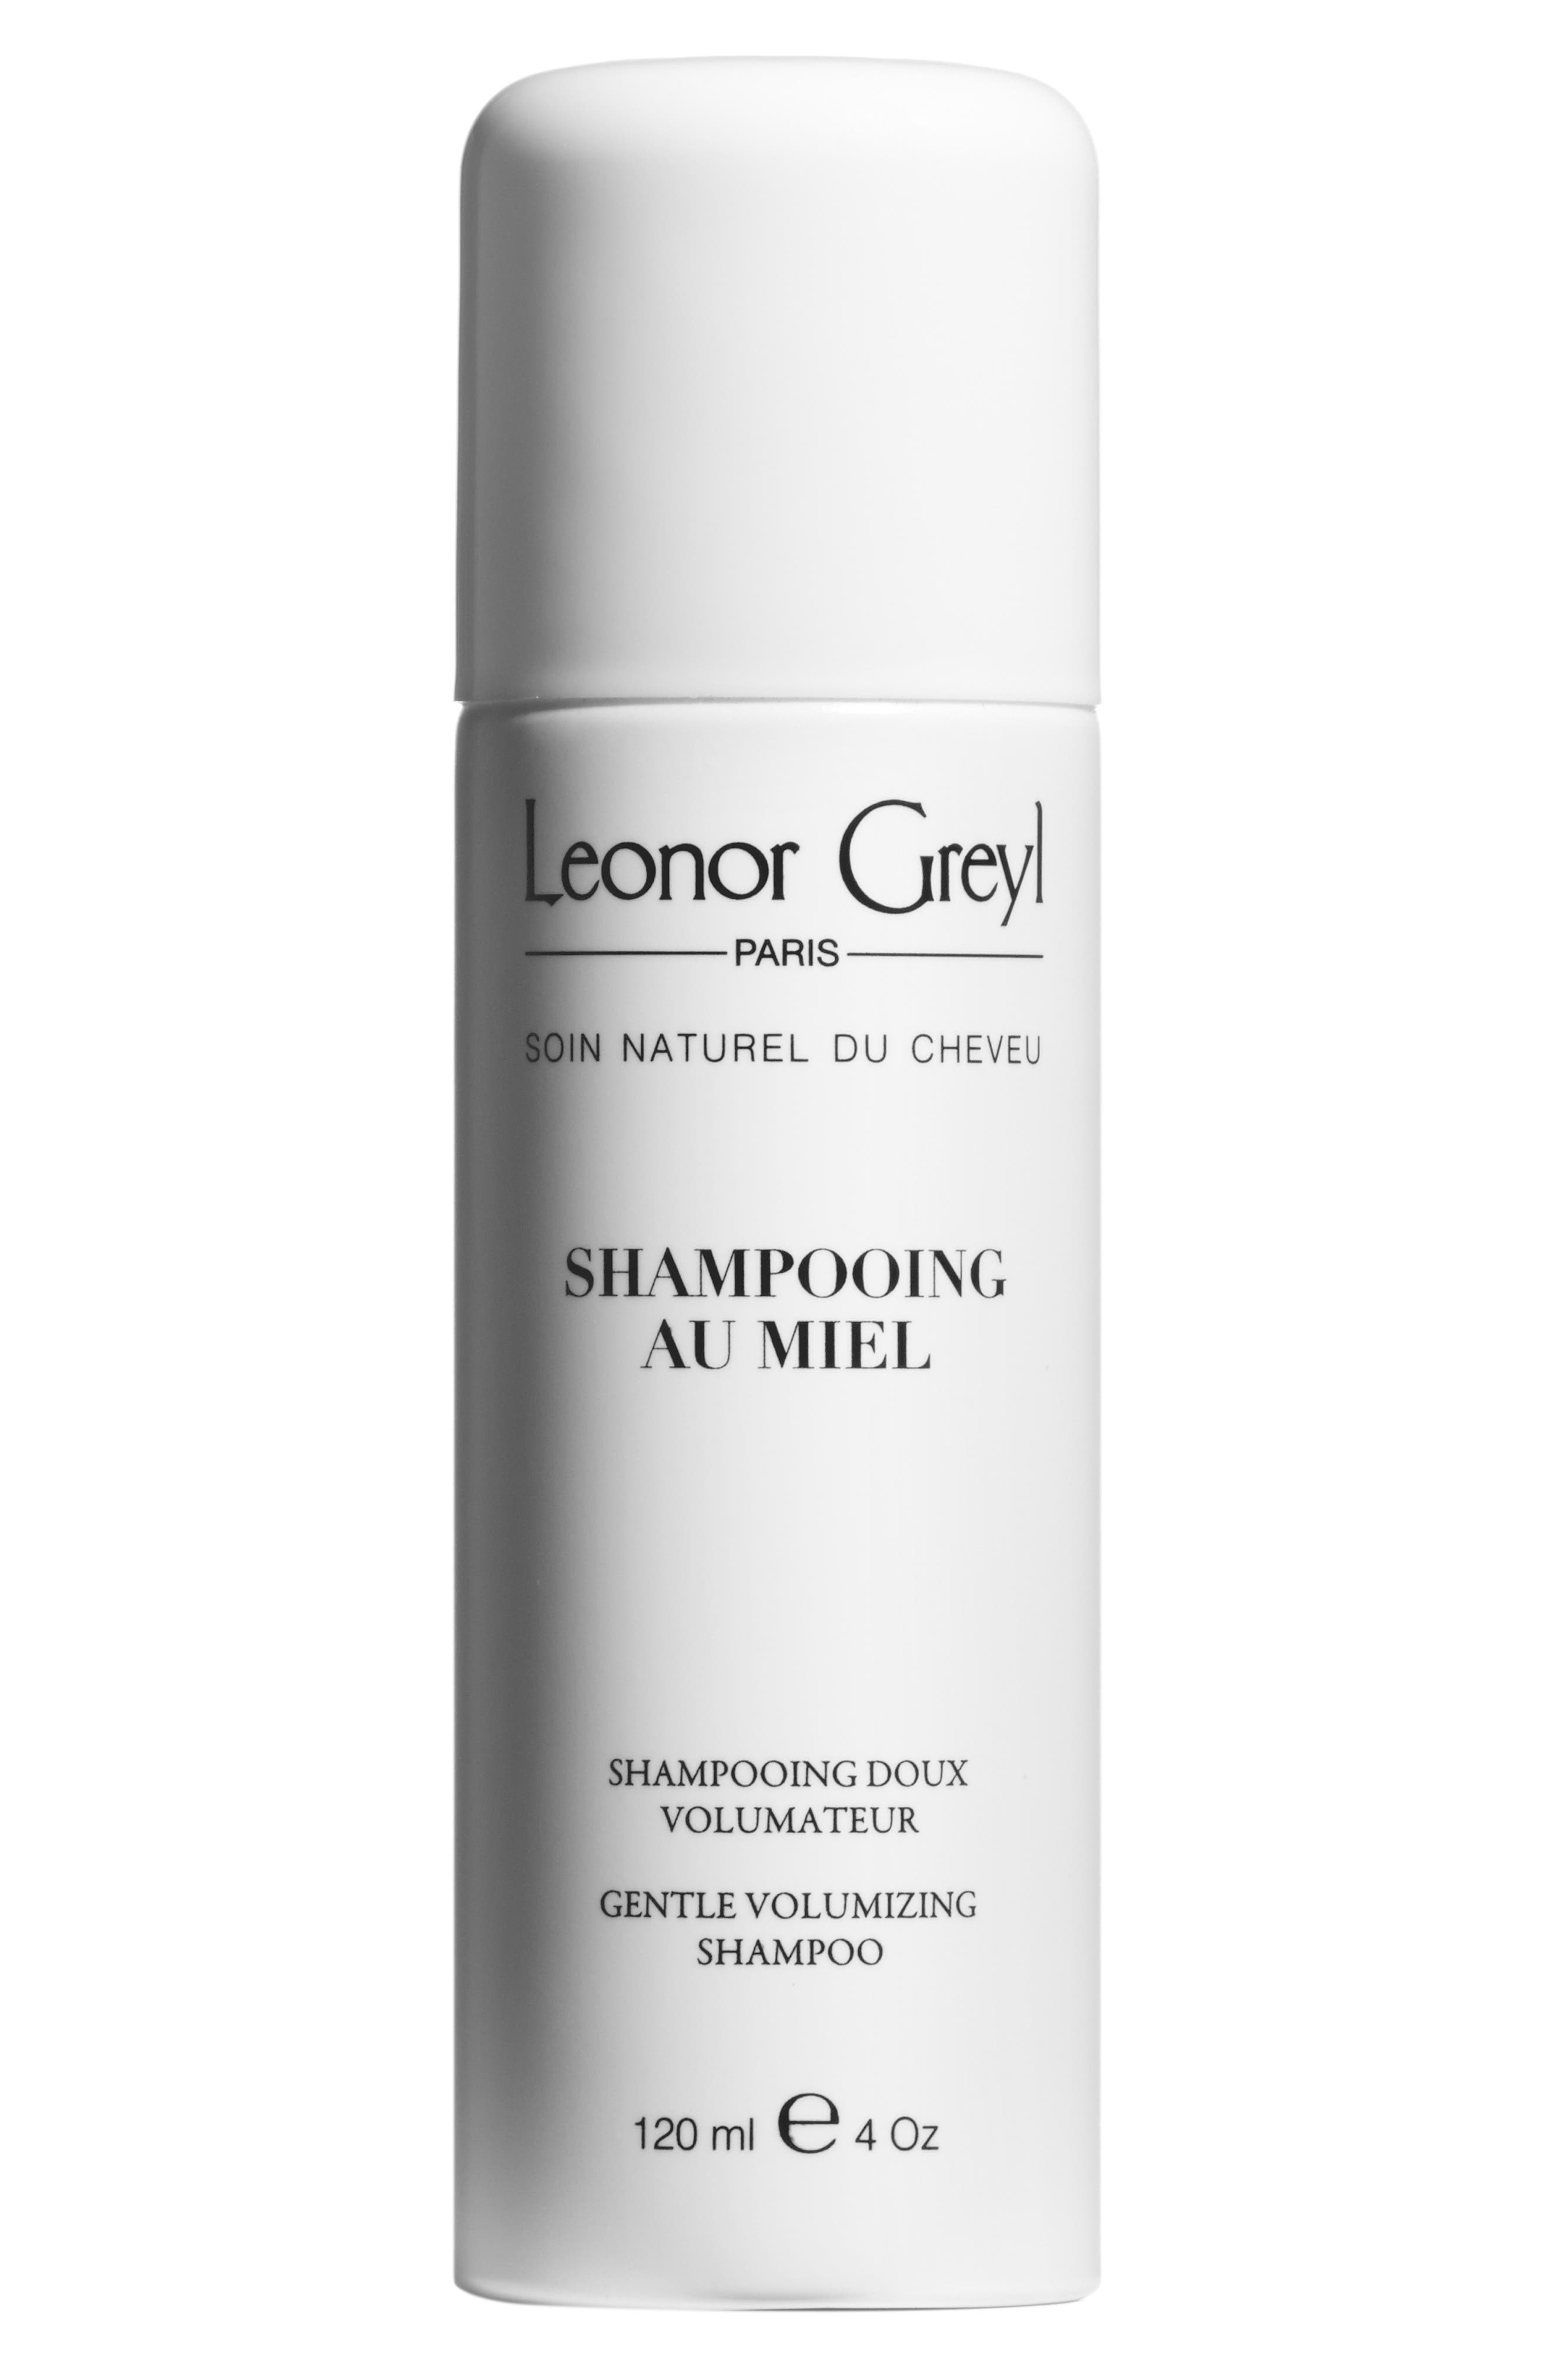 'Shampooing Au Miel' Volumizing Shampoo